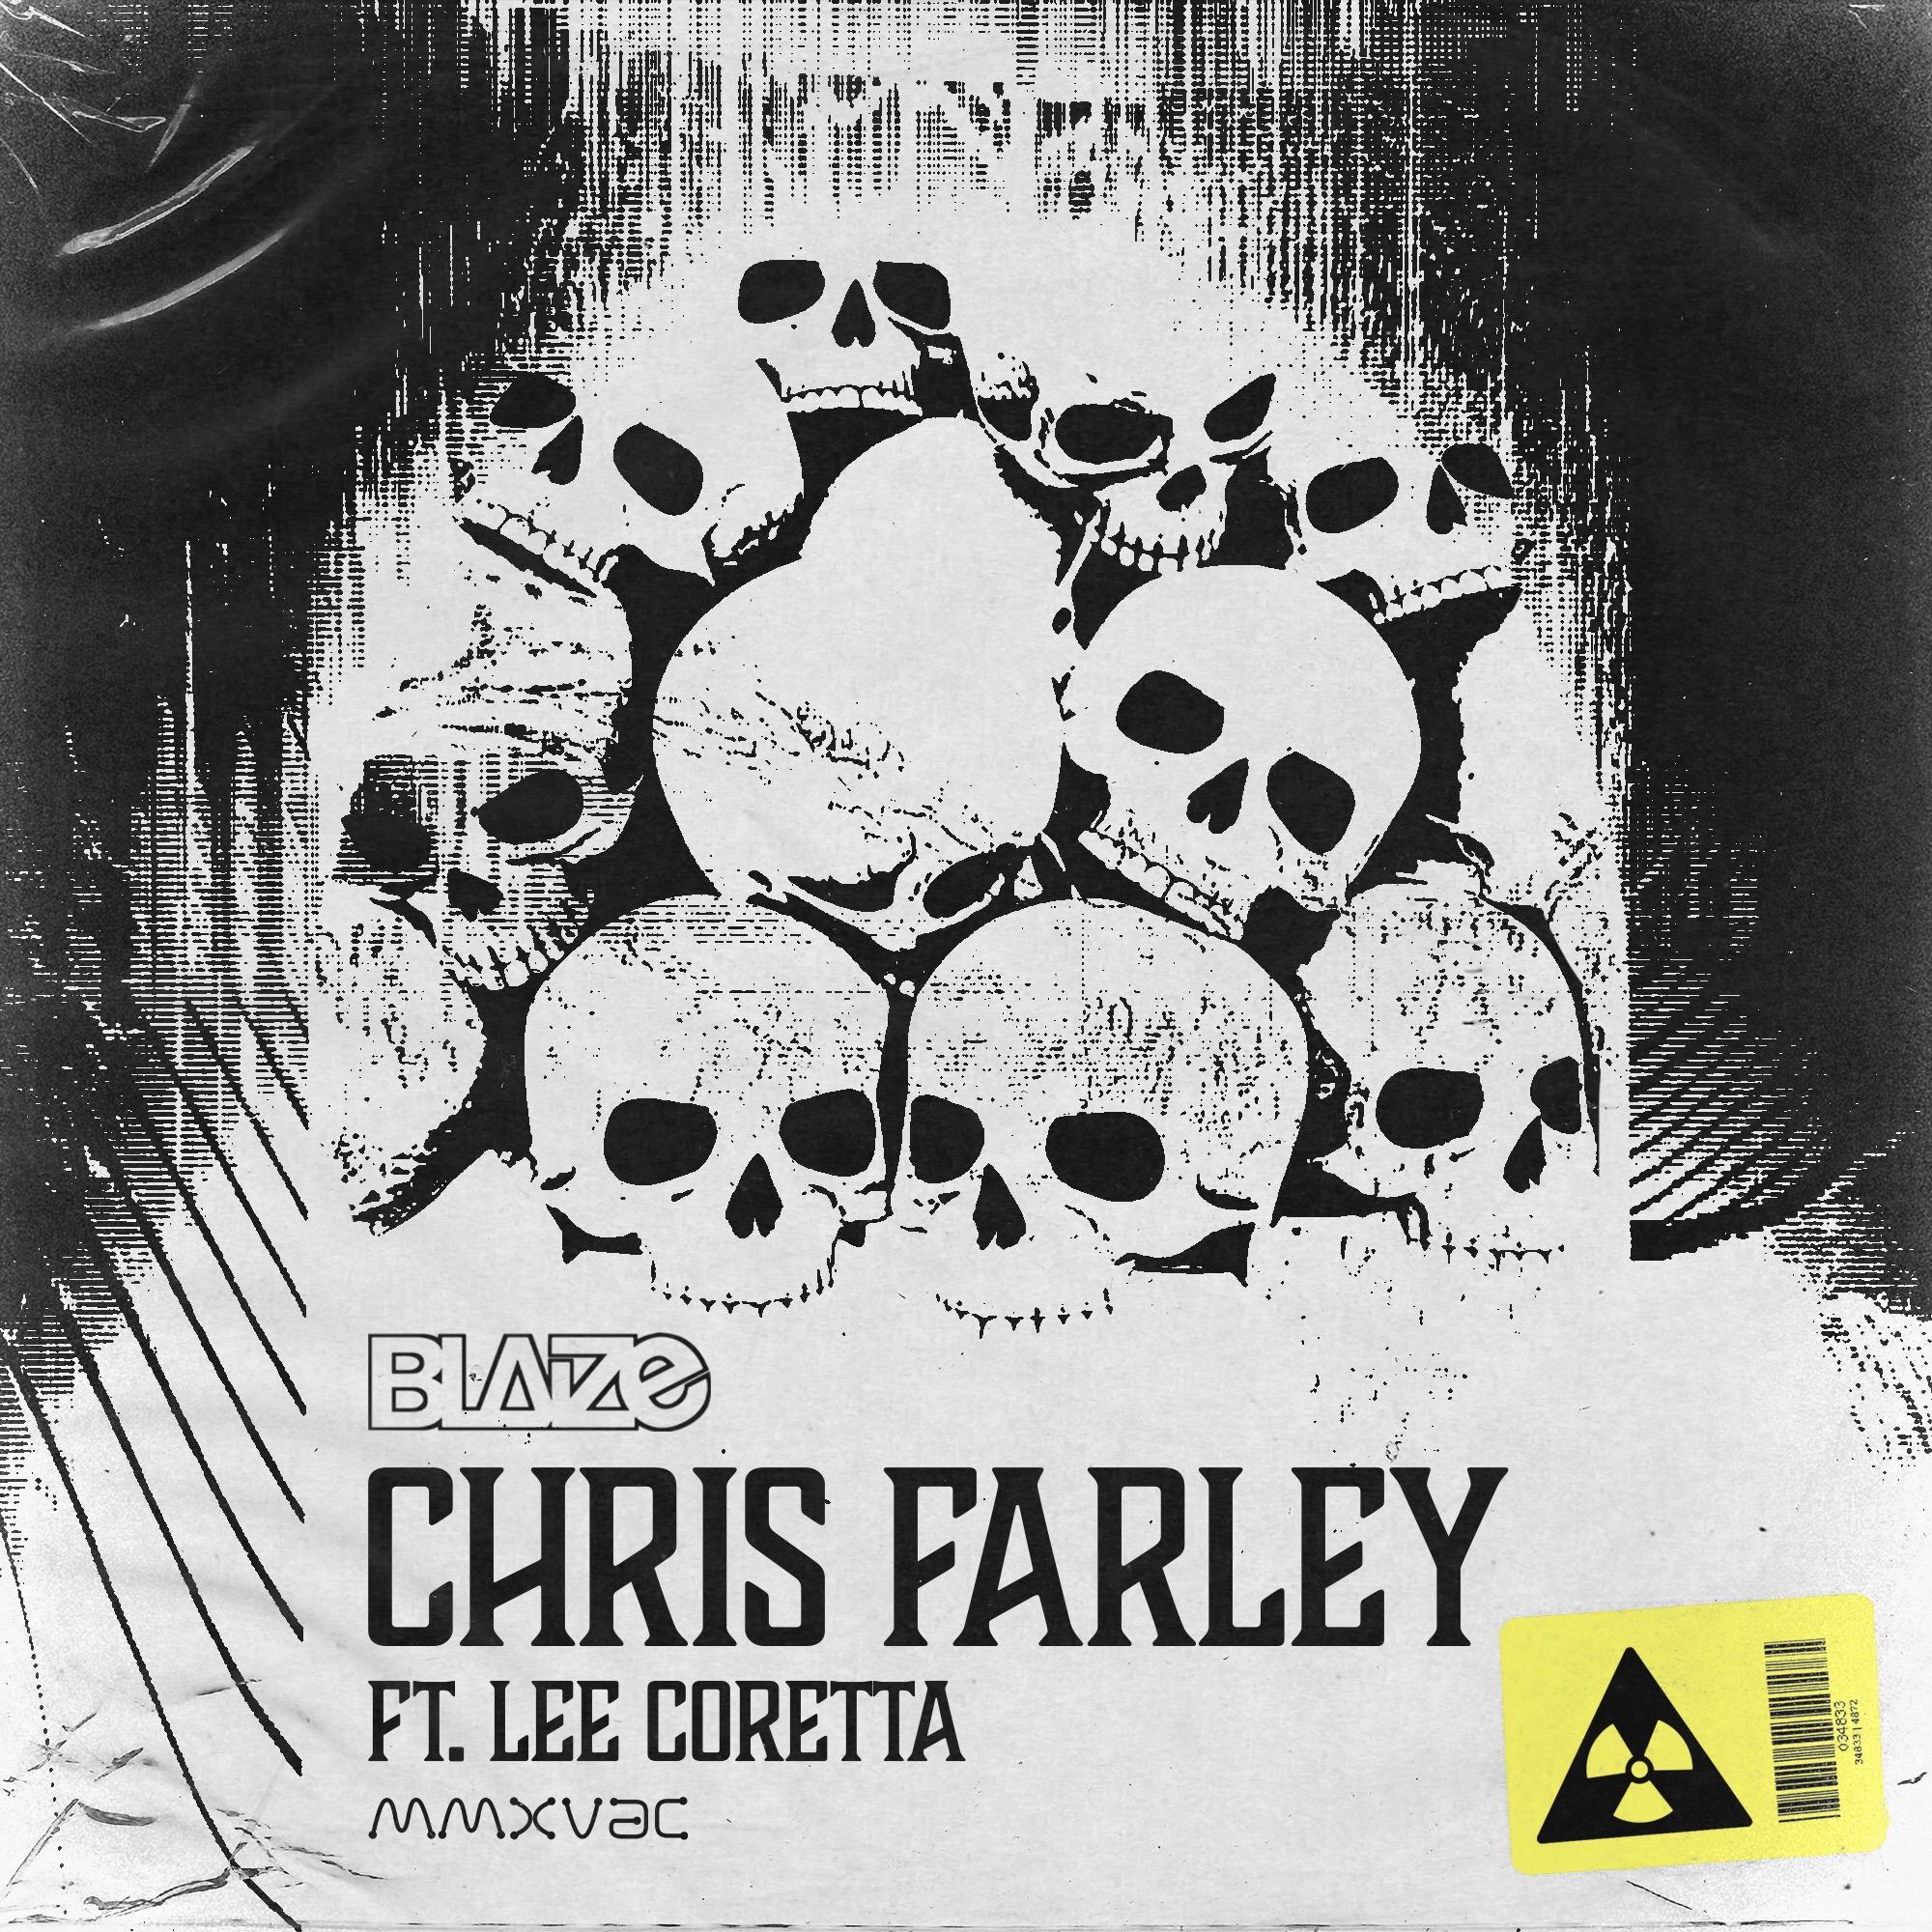 Blaize Ft. Lee Coretta - Chris Farley